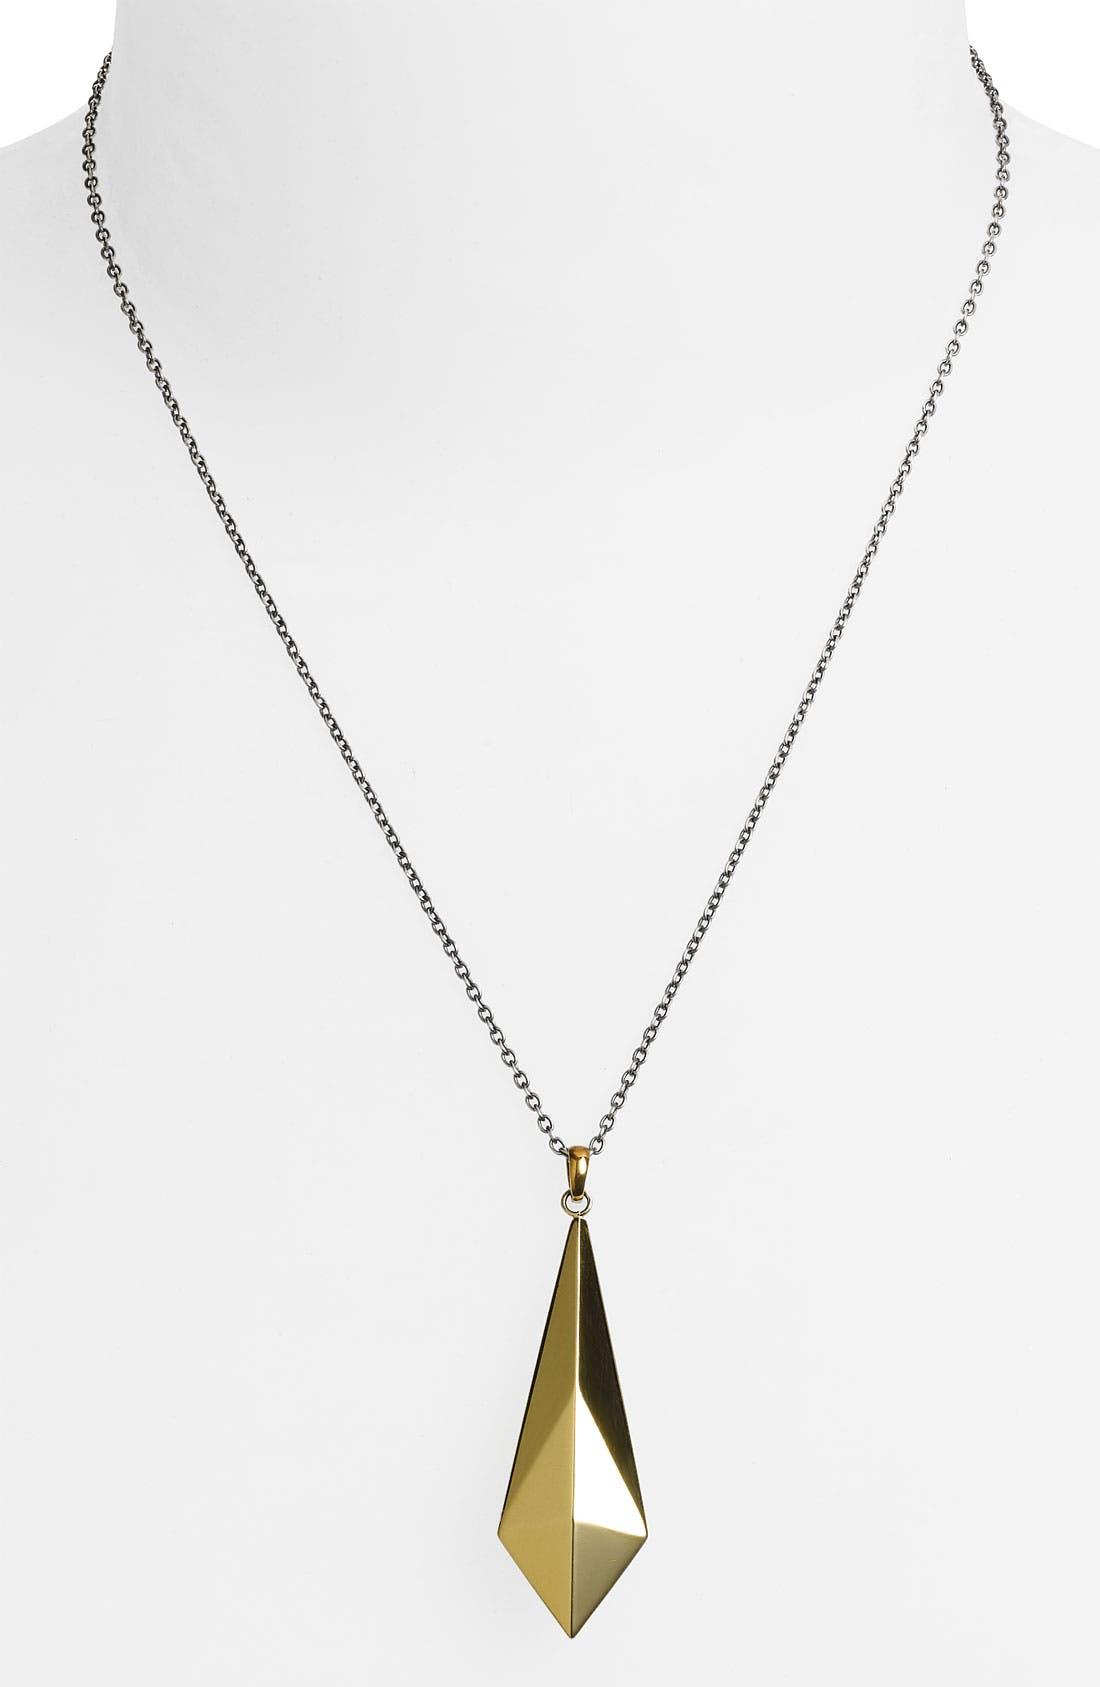 Alternate Image 1 Selected - Elizabeth and James 'Geodesic' Pendant Necklace